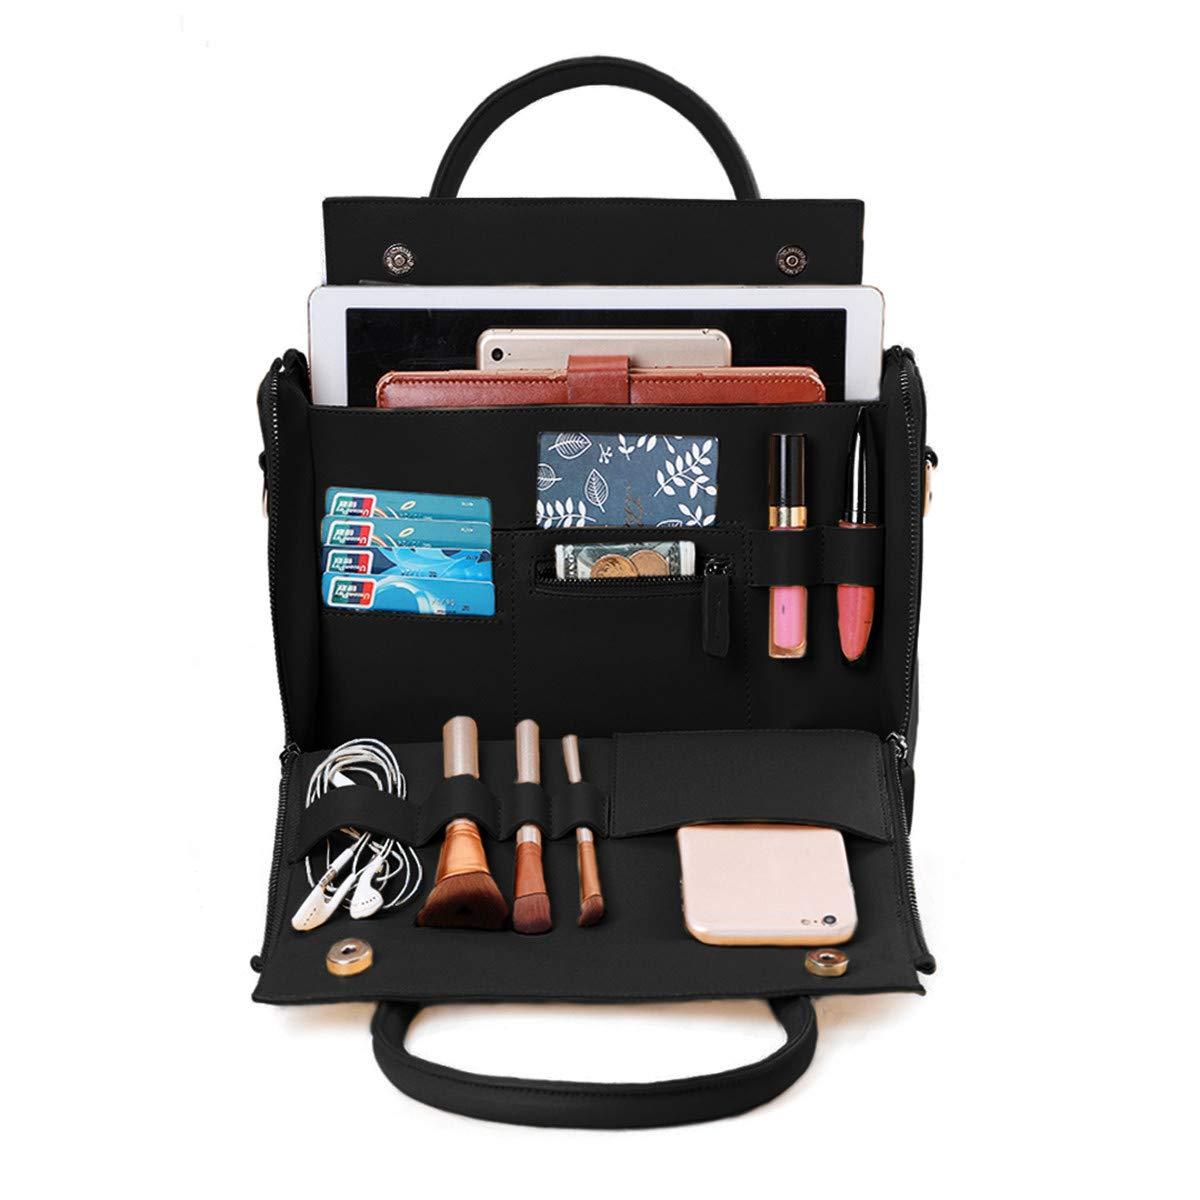 Brenice Travel Makeup Bag, Women Solid Cosmetic Handbag Capacity Bag Multifunction Crossbody Bag Black 9.25''x 4.75''x 6.5''